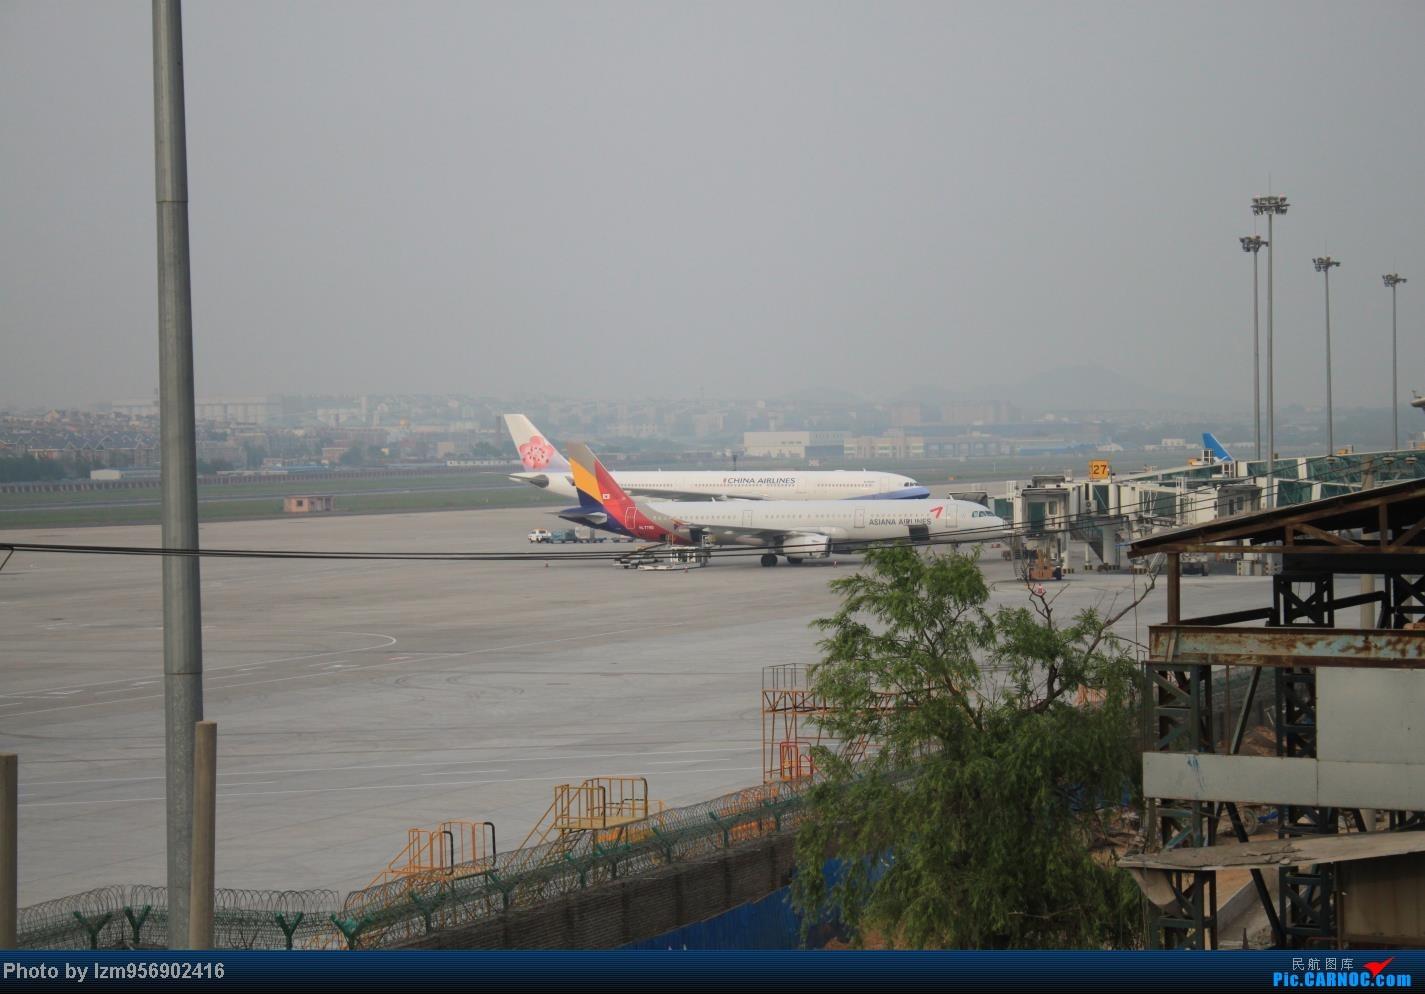 Re:[原创]DLC蹲点大半天,拍到了大棒航空772=w= AIRBUS A330-300 B-18357 中国大连周水子机场